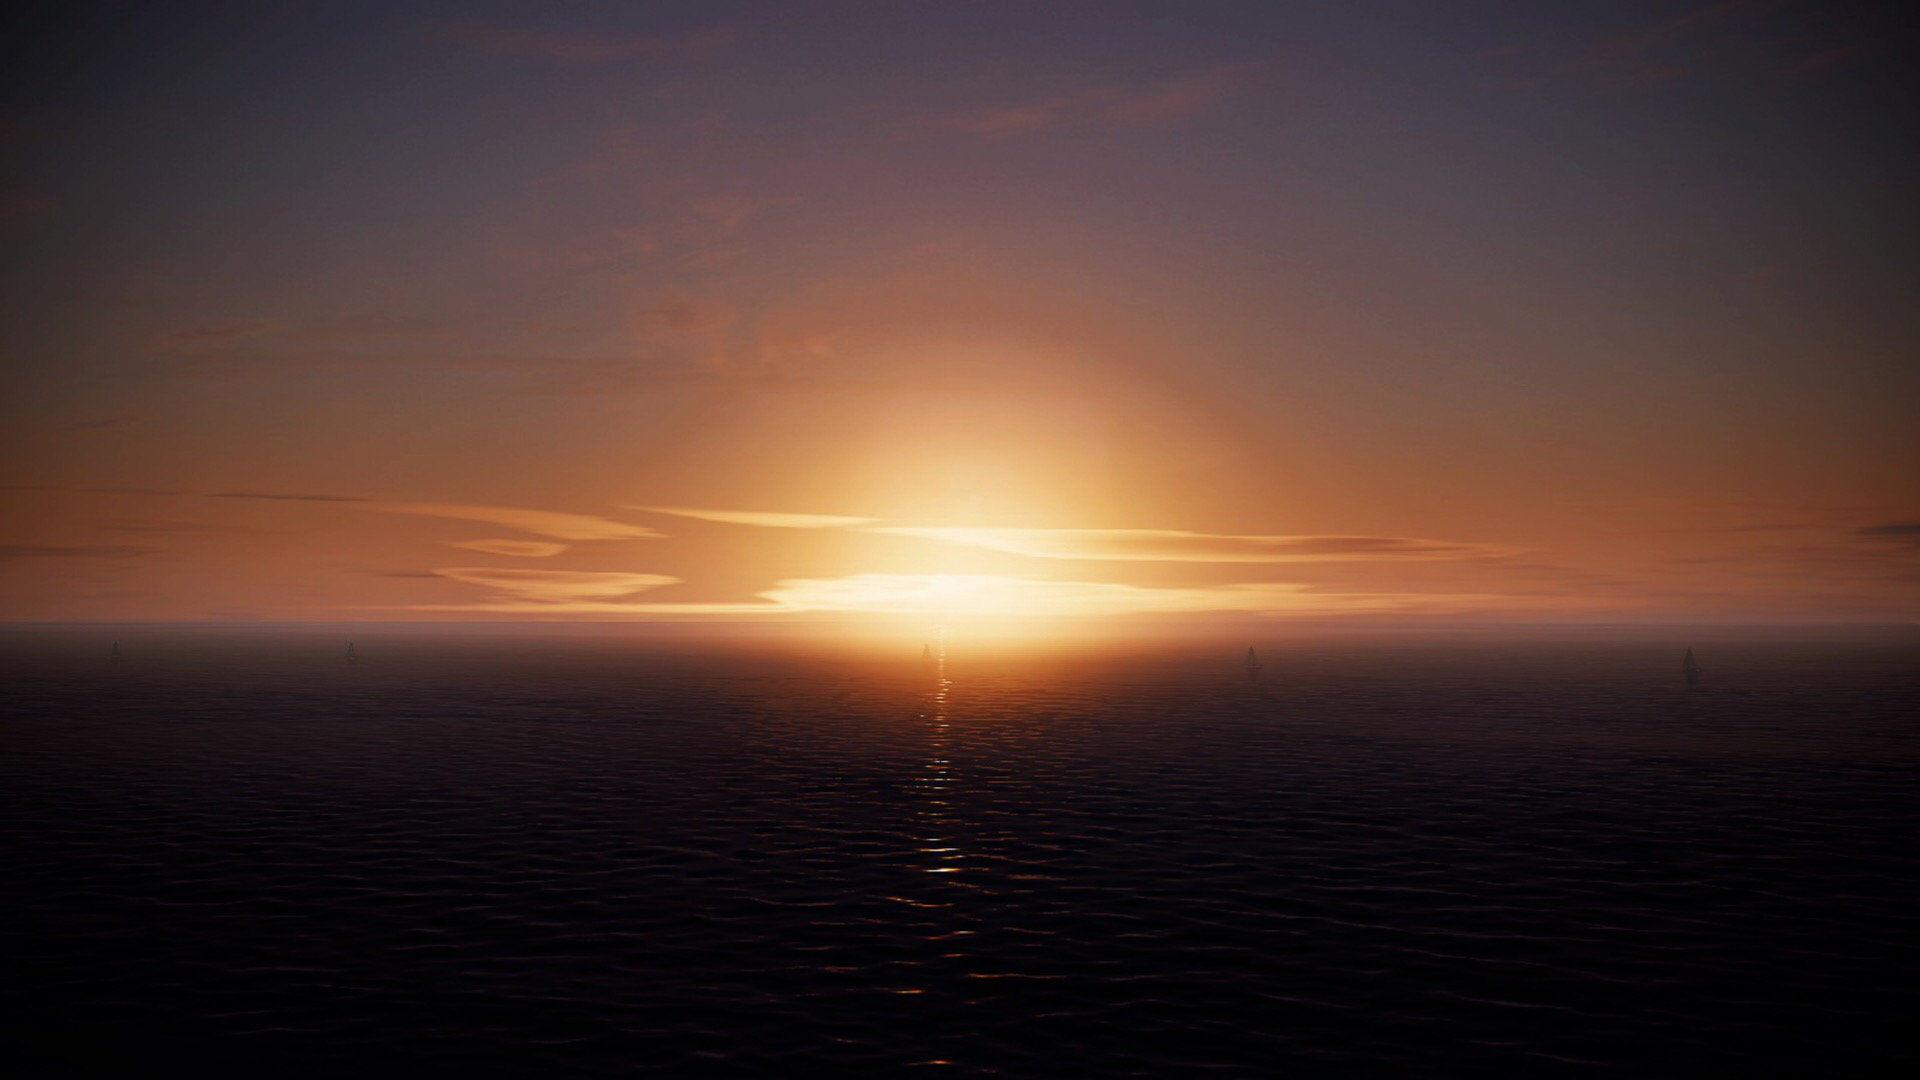 The San Francisco Horizon.